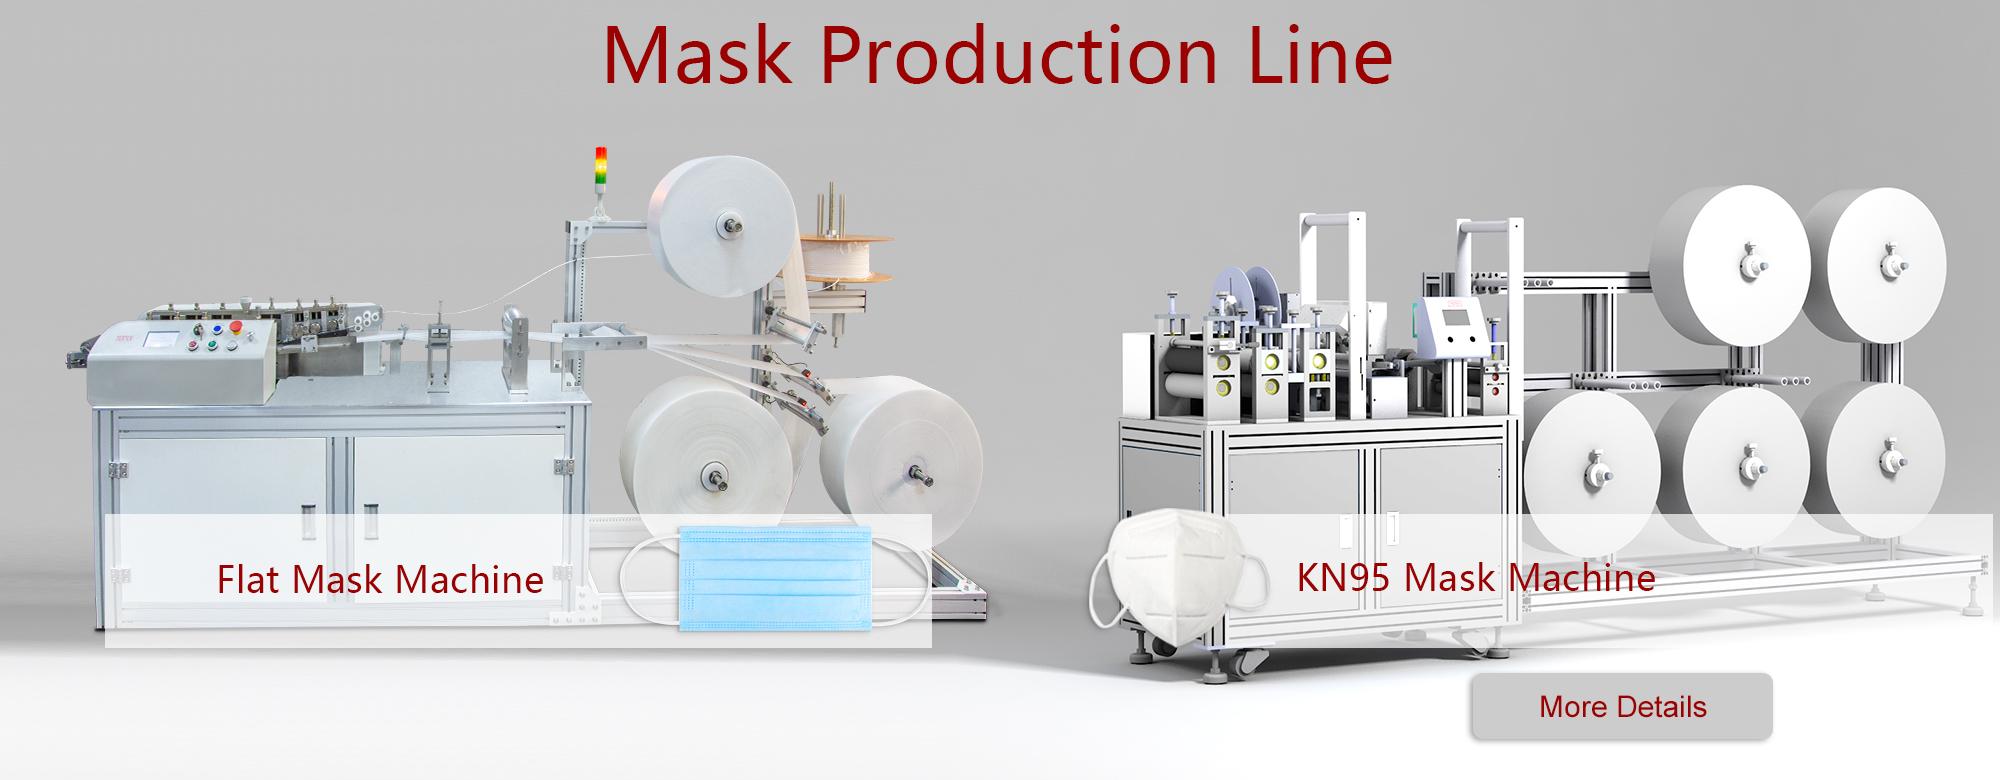 Mask Production Line-Flat Mask and KN95 Mask